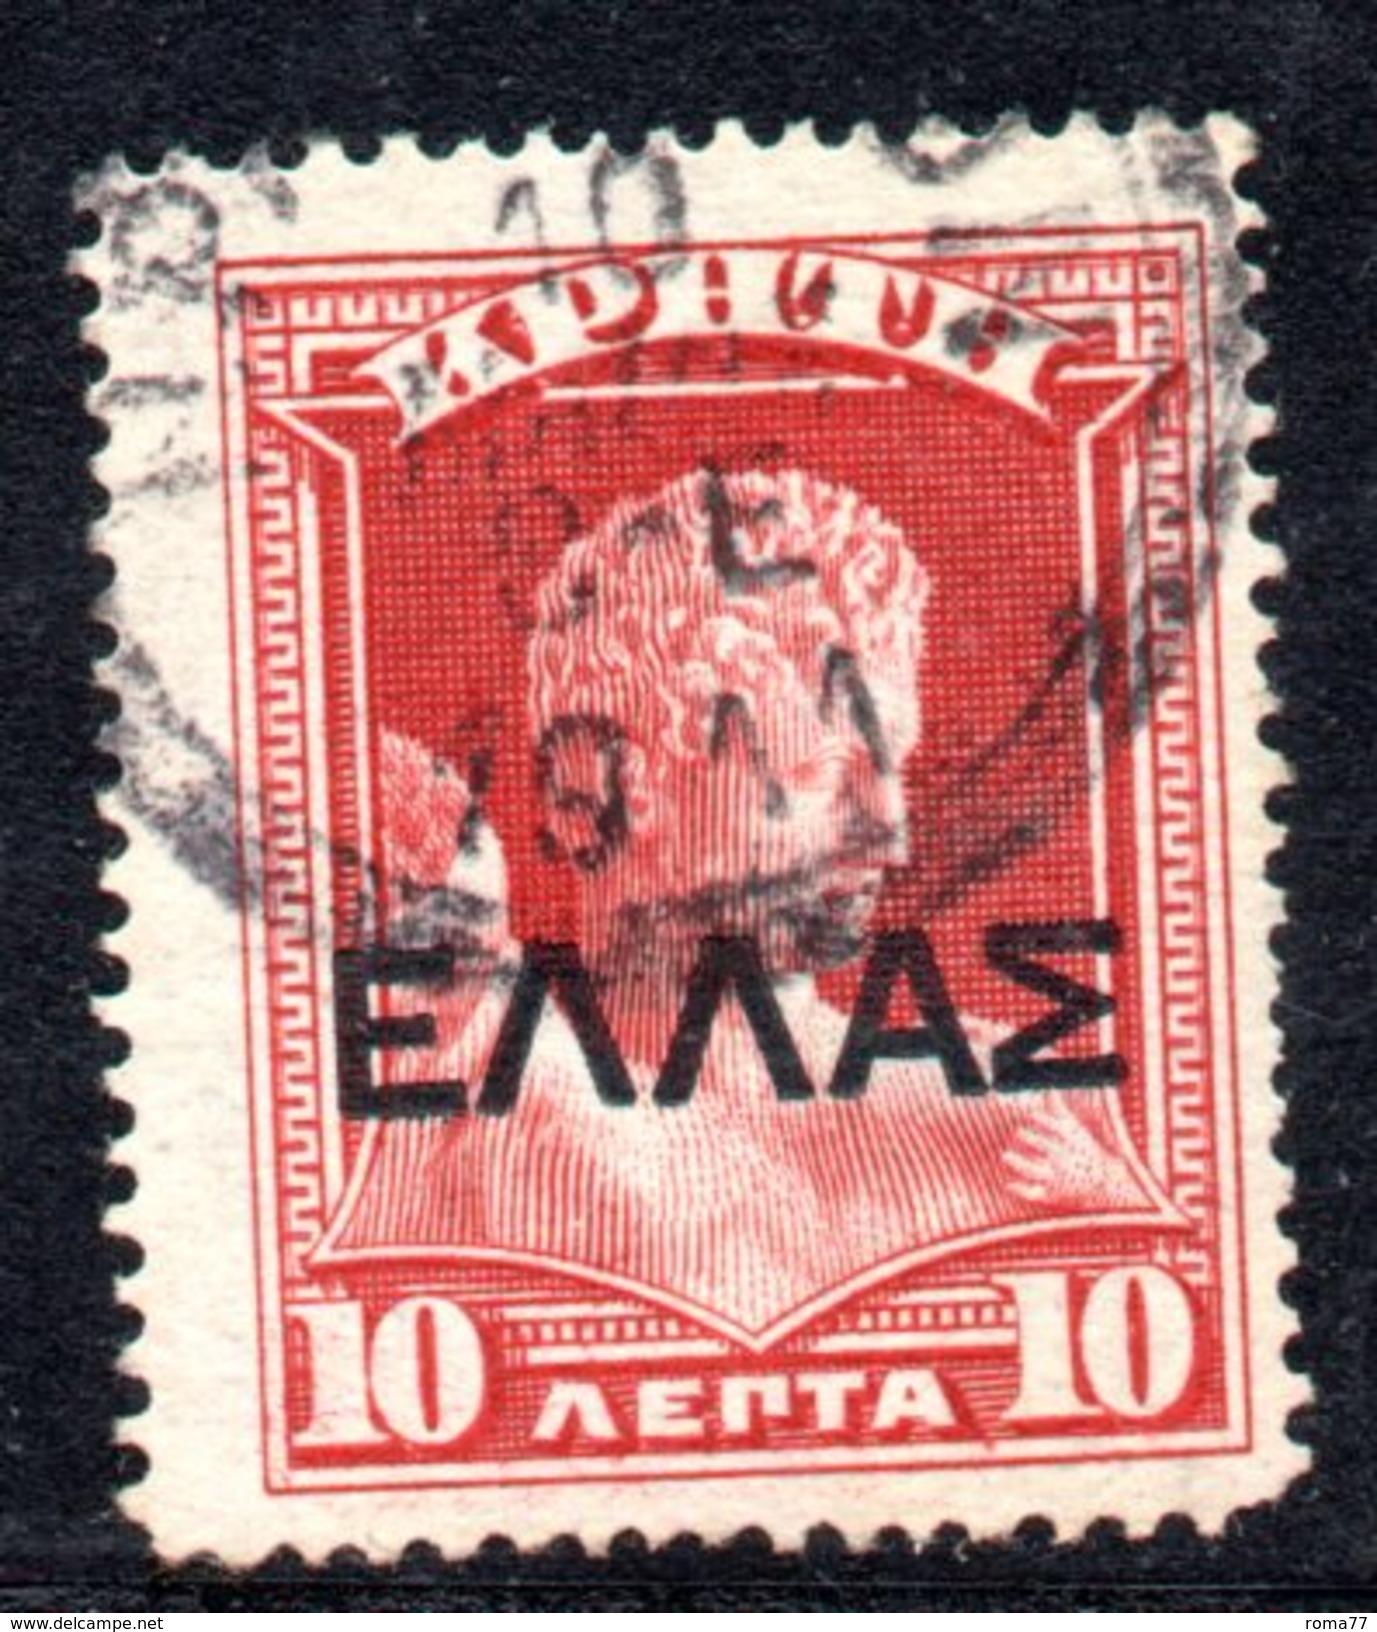 XP2908 - CRETA , 10  Lepta Rosso  Usato : Soprastampa Nera - Creta